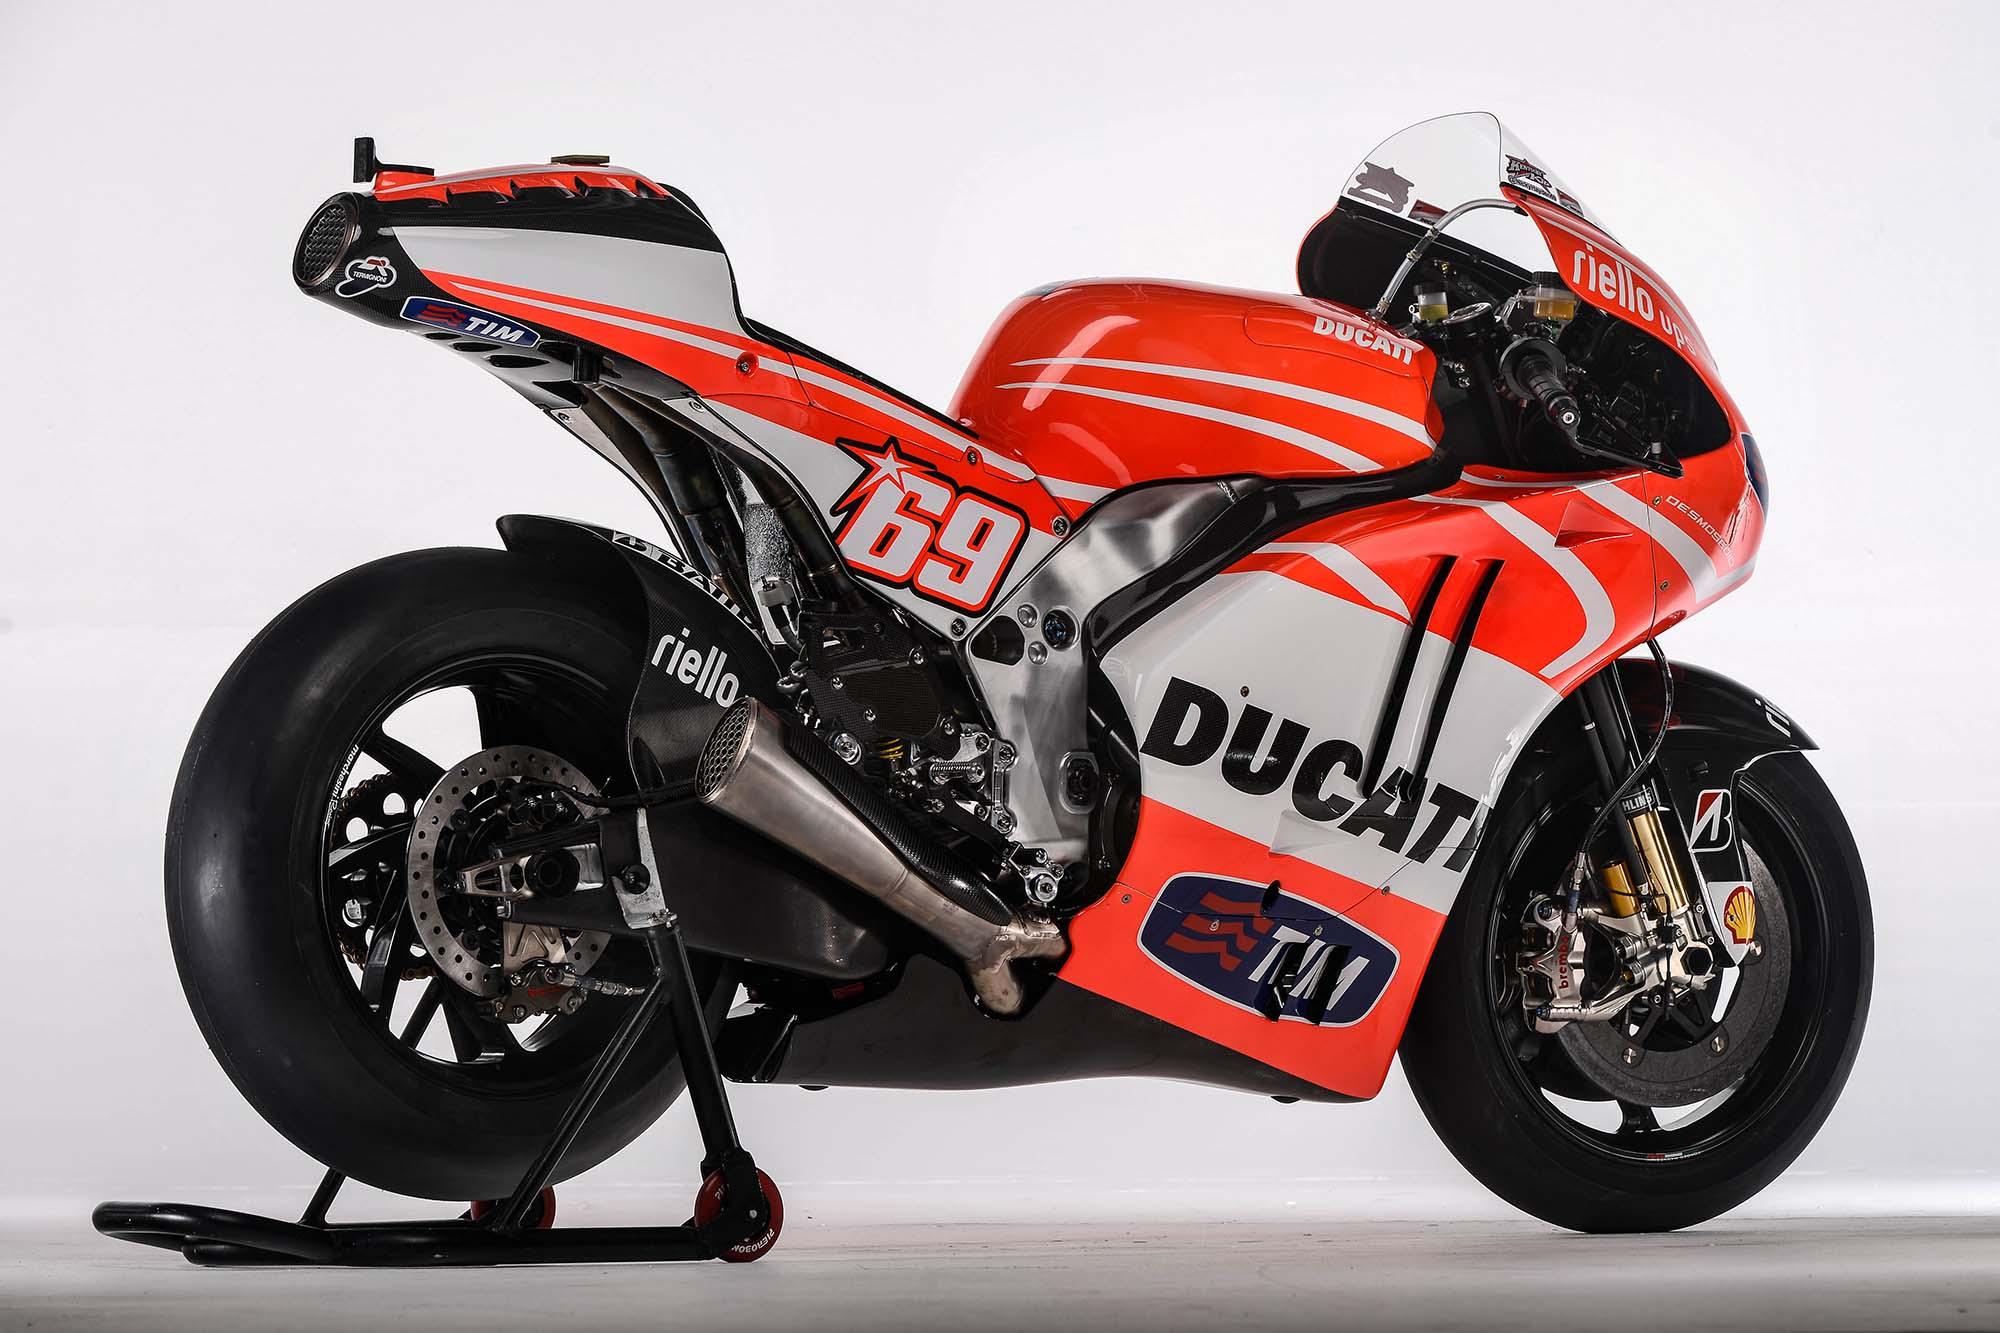 Ducati Desmosedici GP13 - 2000x1333